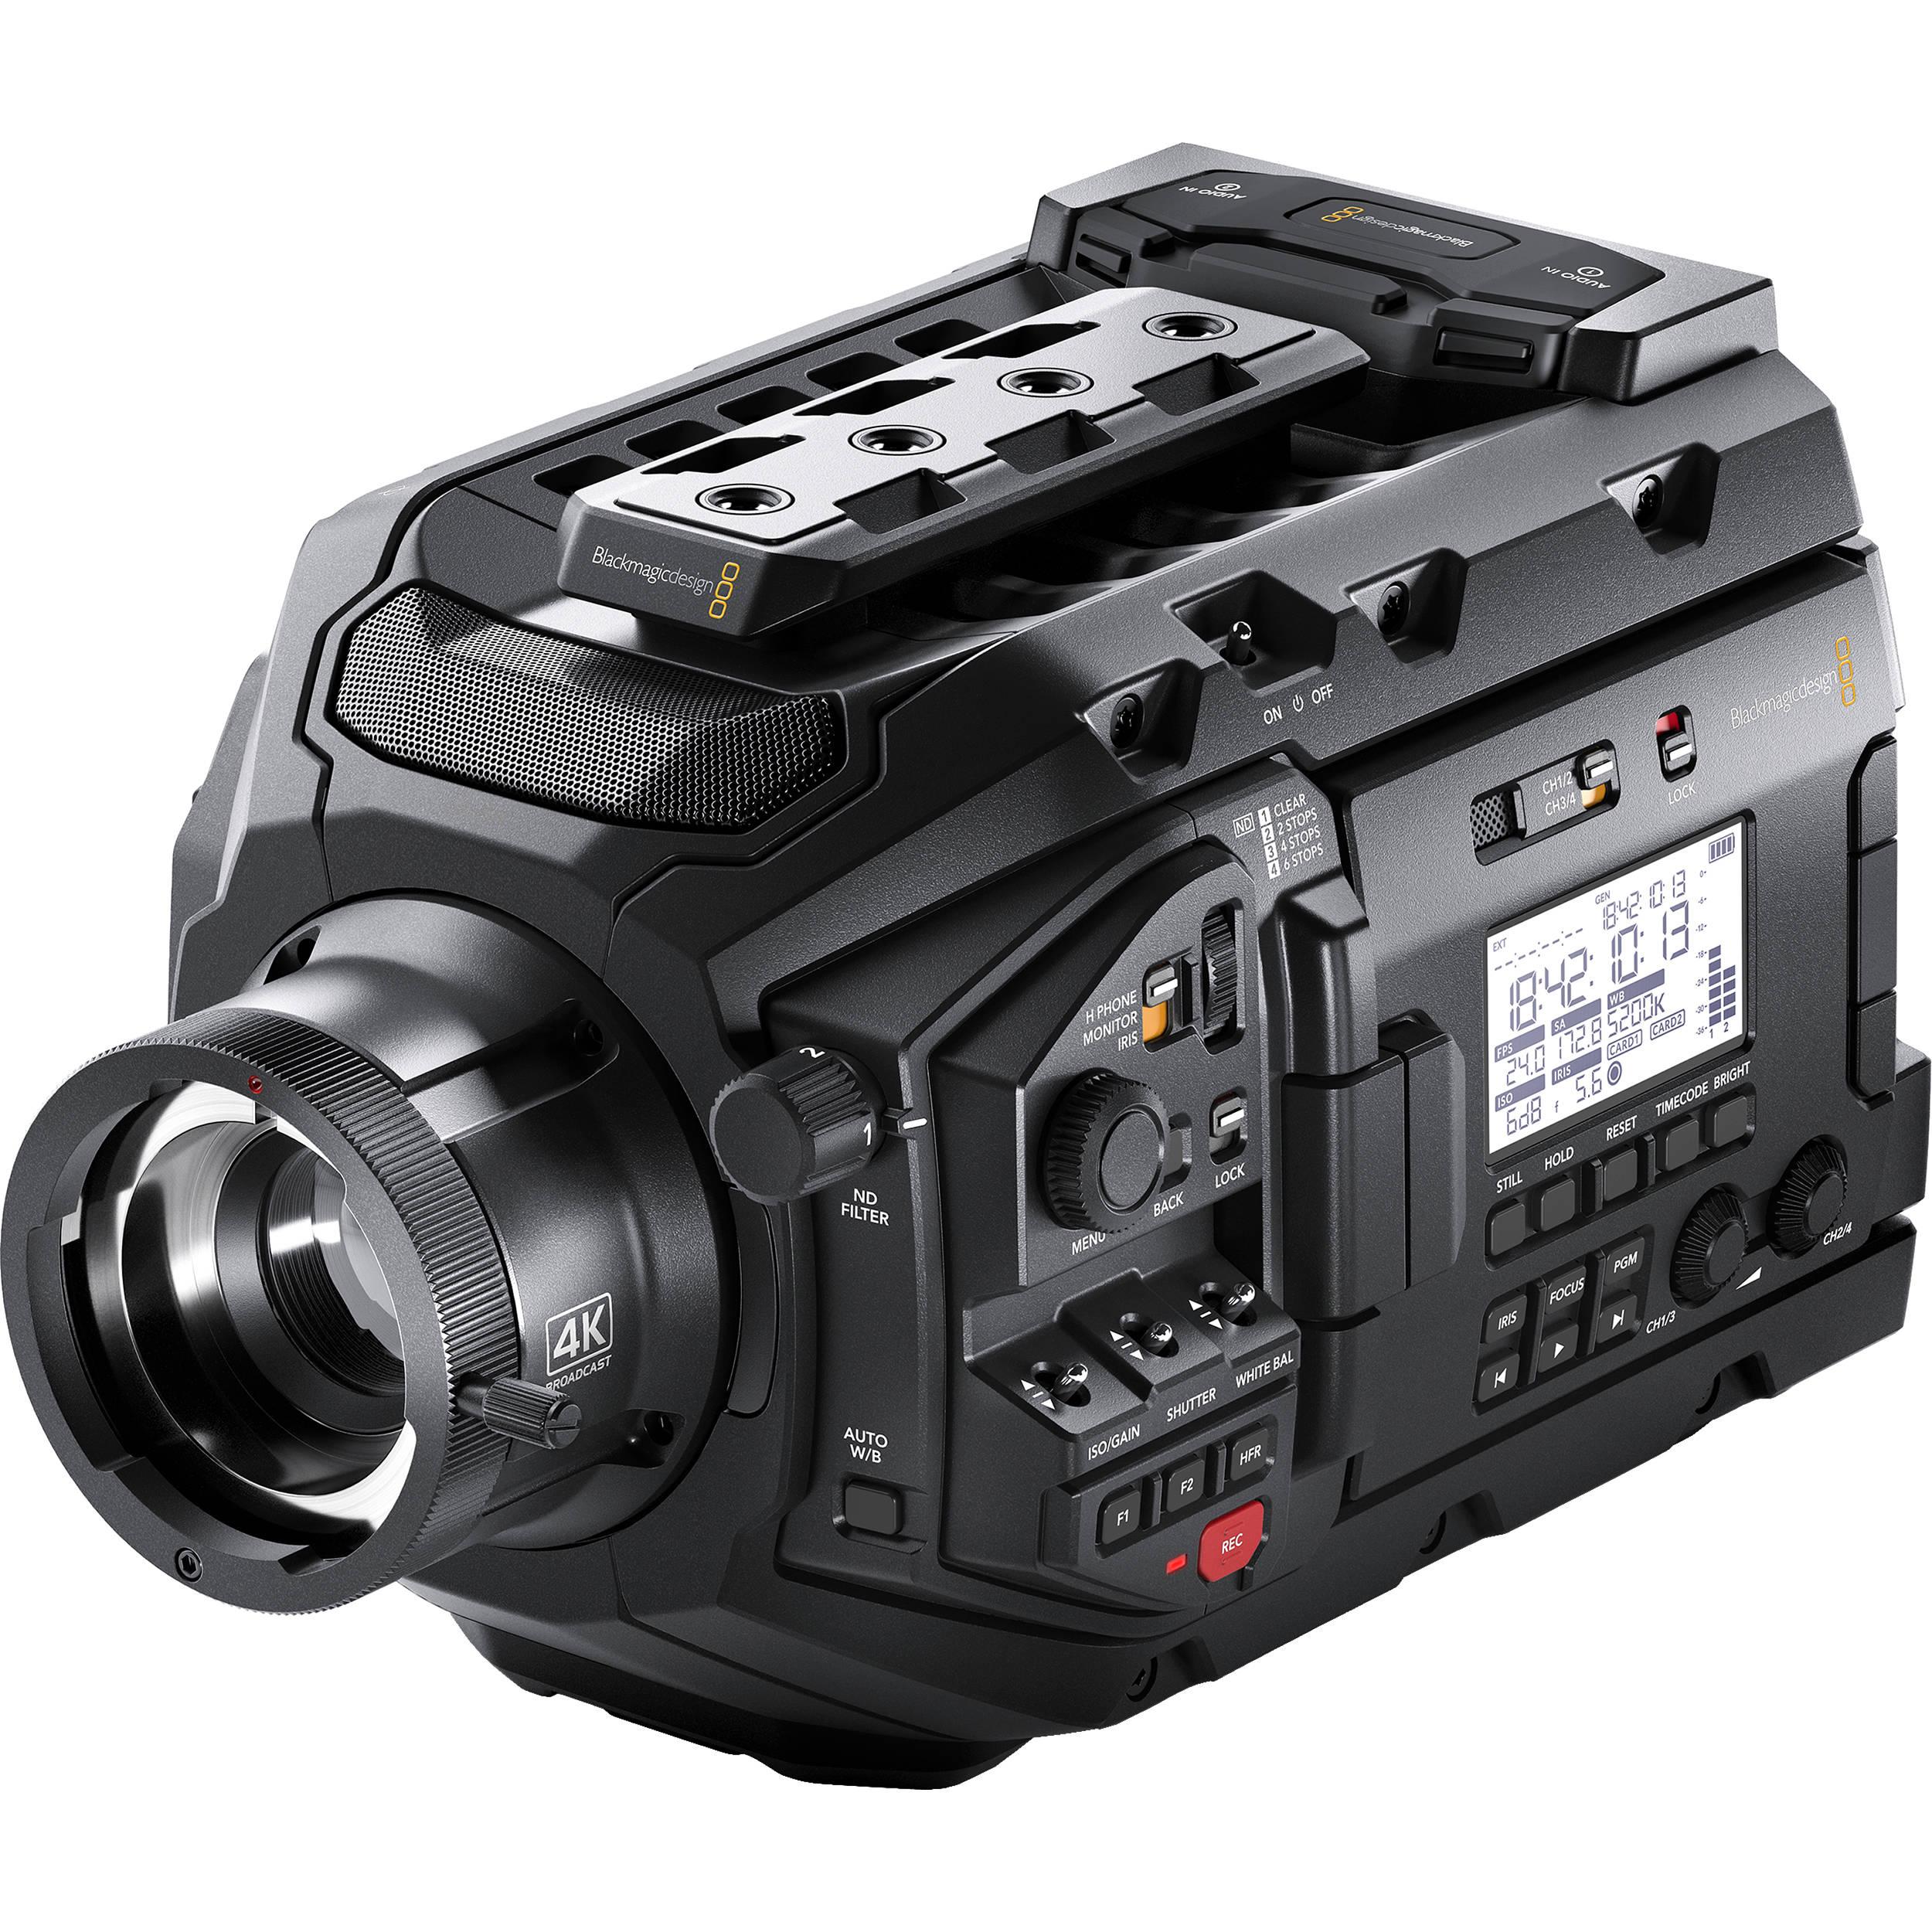 Blackmagic Design URSA Broadcast Camera CINEURSAMWC4K B&H Photo